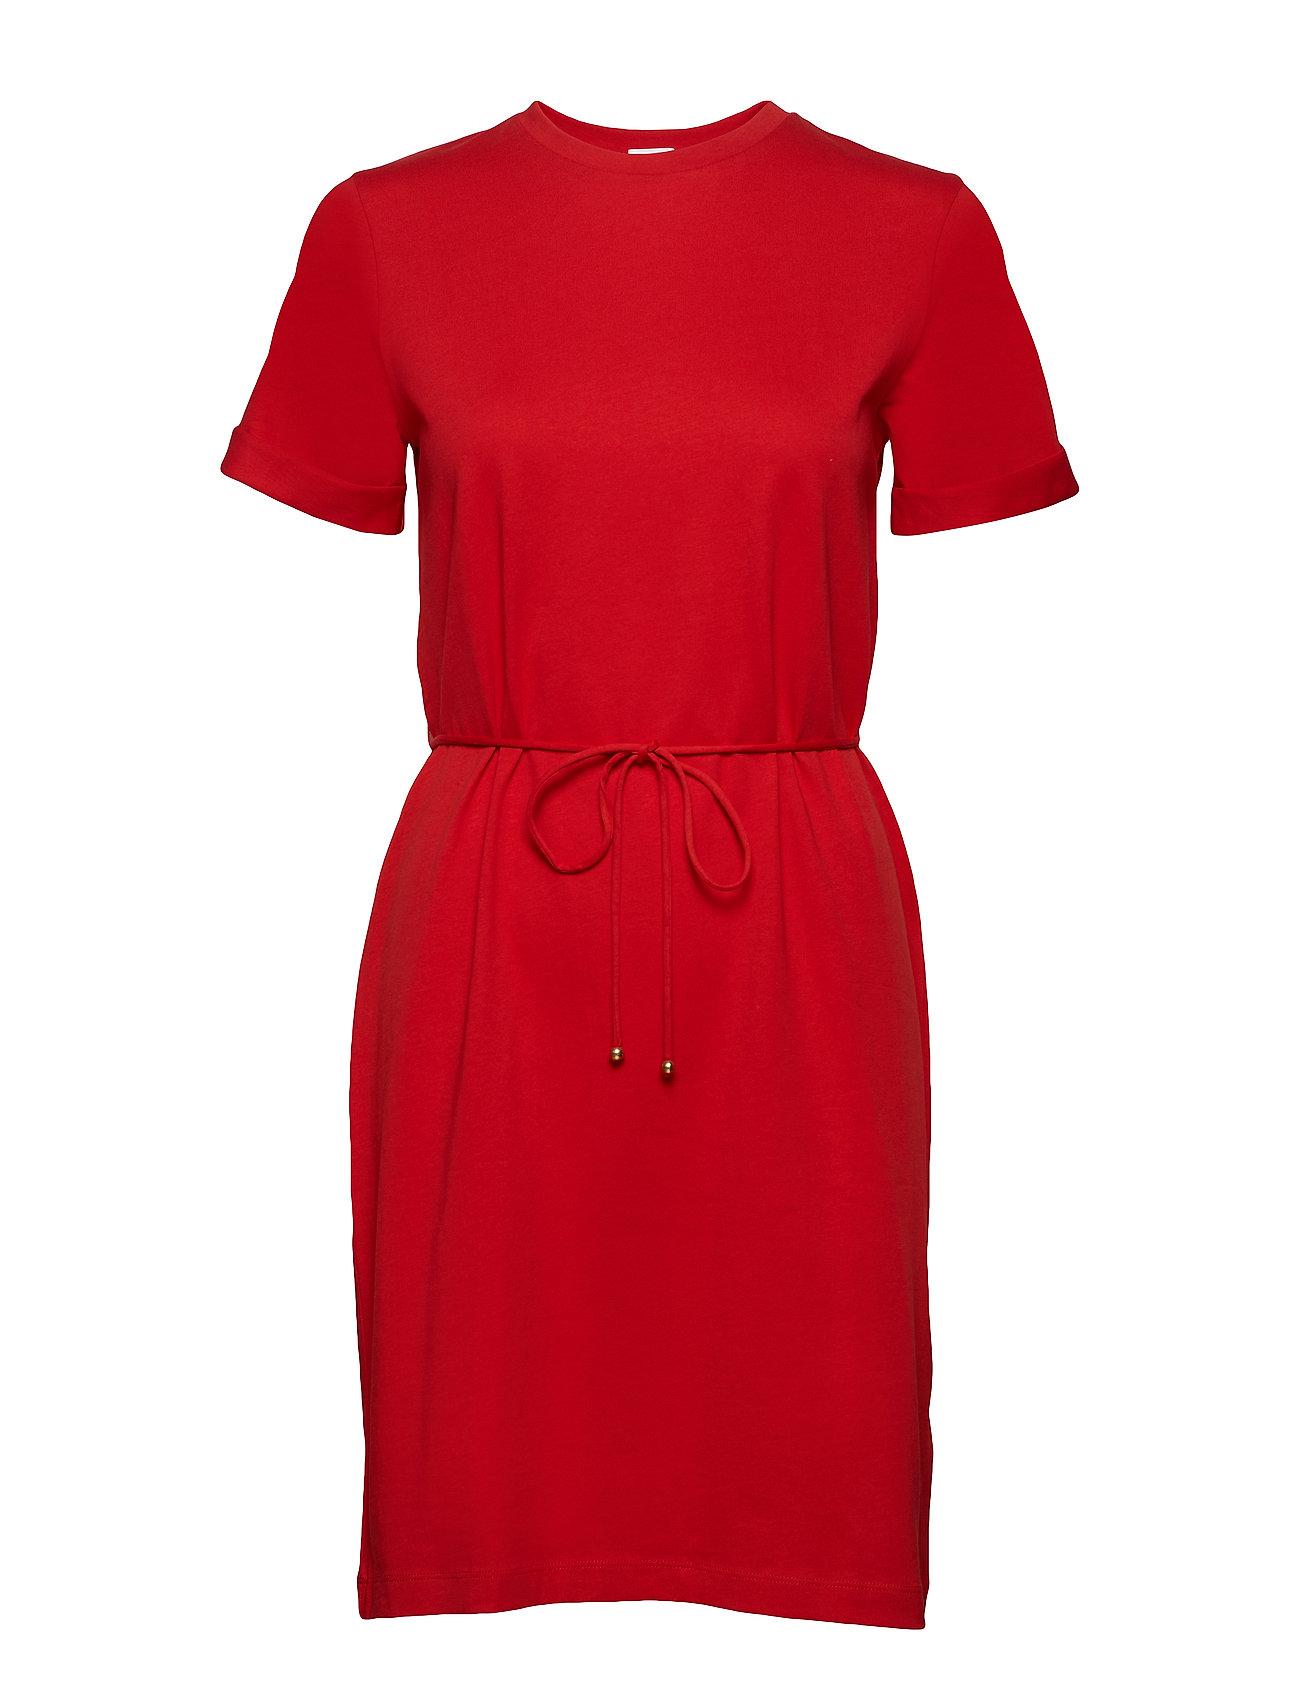 Filippa K Crew Neck T-shirt dress - BERRY RED